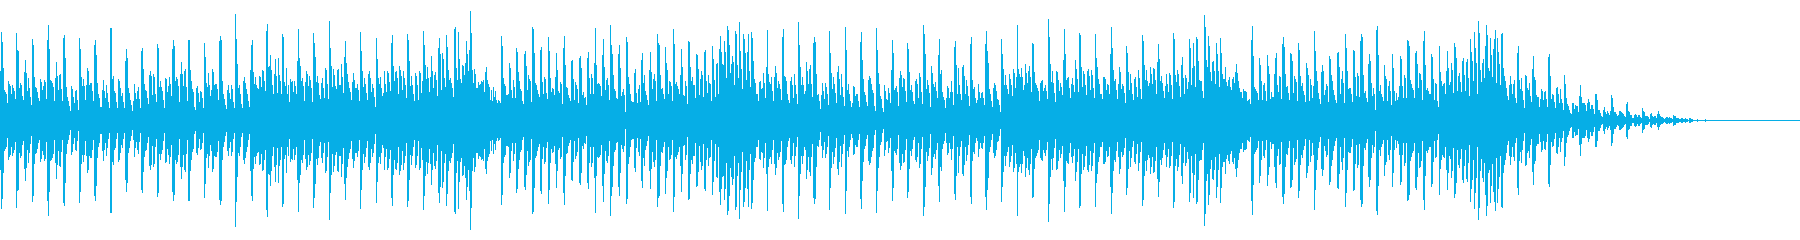 8bitクラシック-カプリース-の再生済みの波形